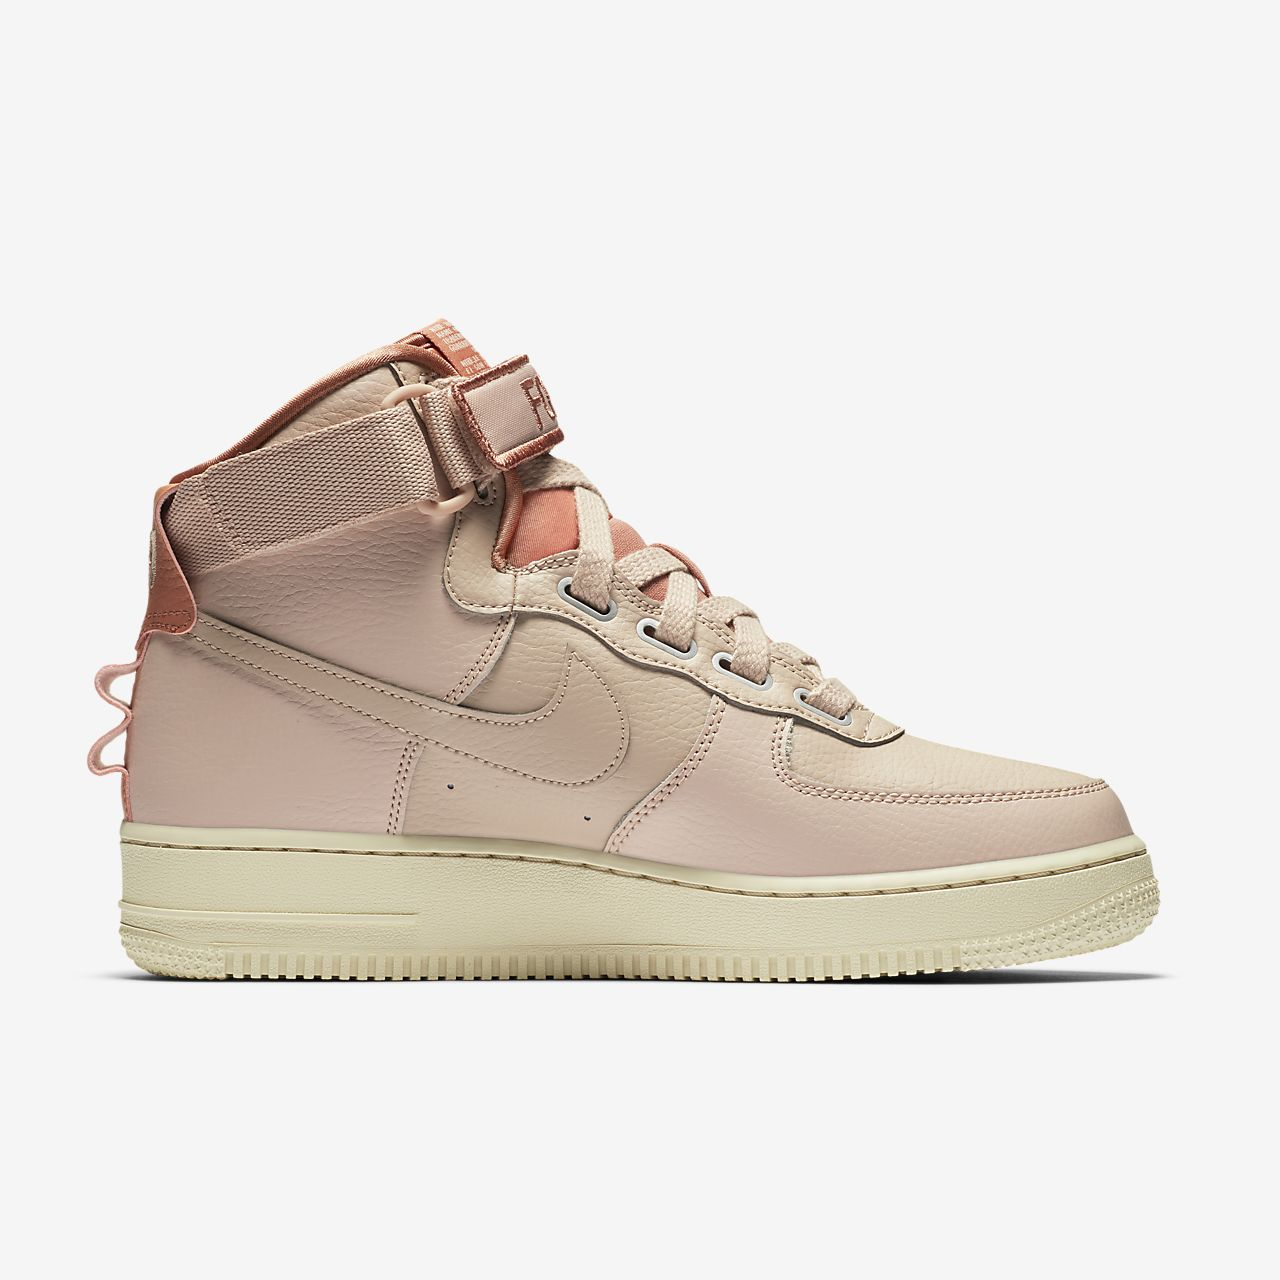 release info on bd801 f4ea2 ... Nike Air Force 1 High Utility Women s Shoe